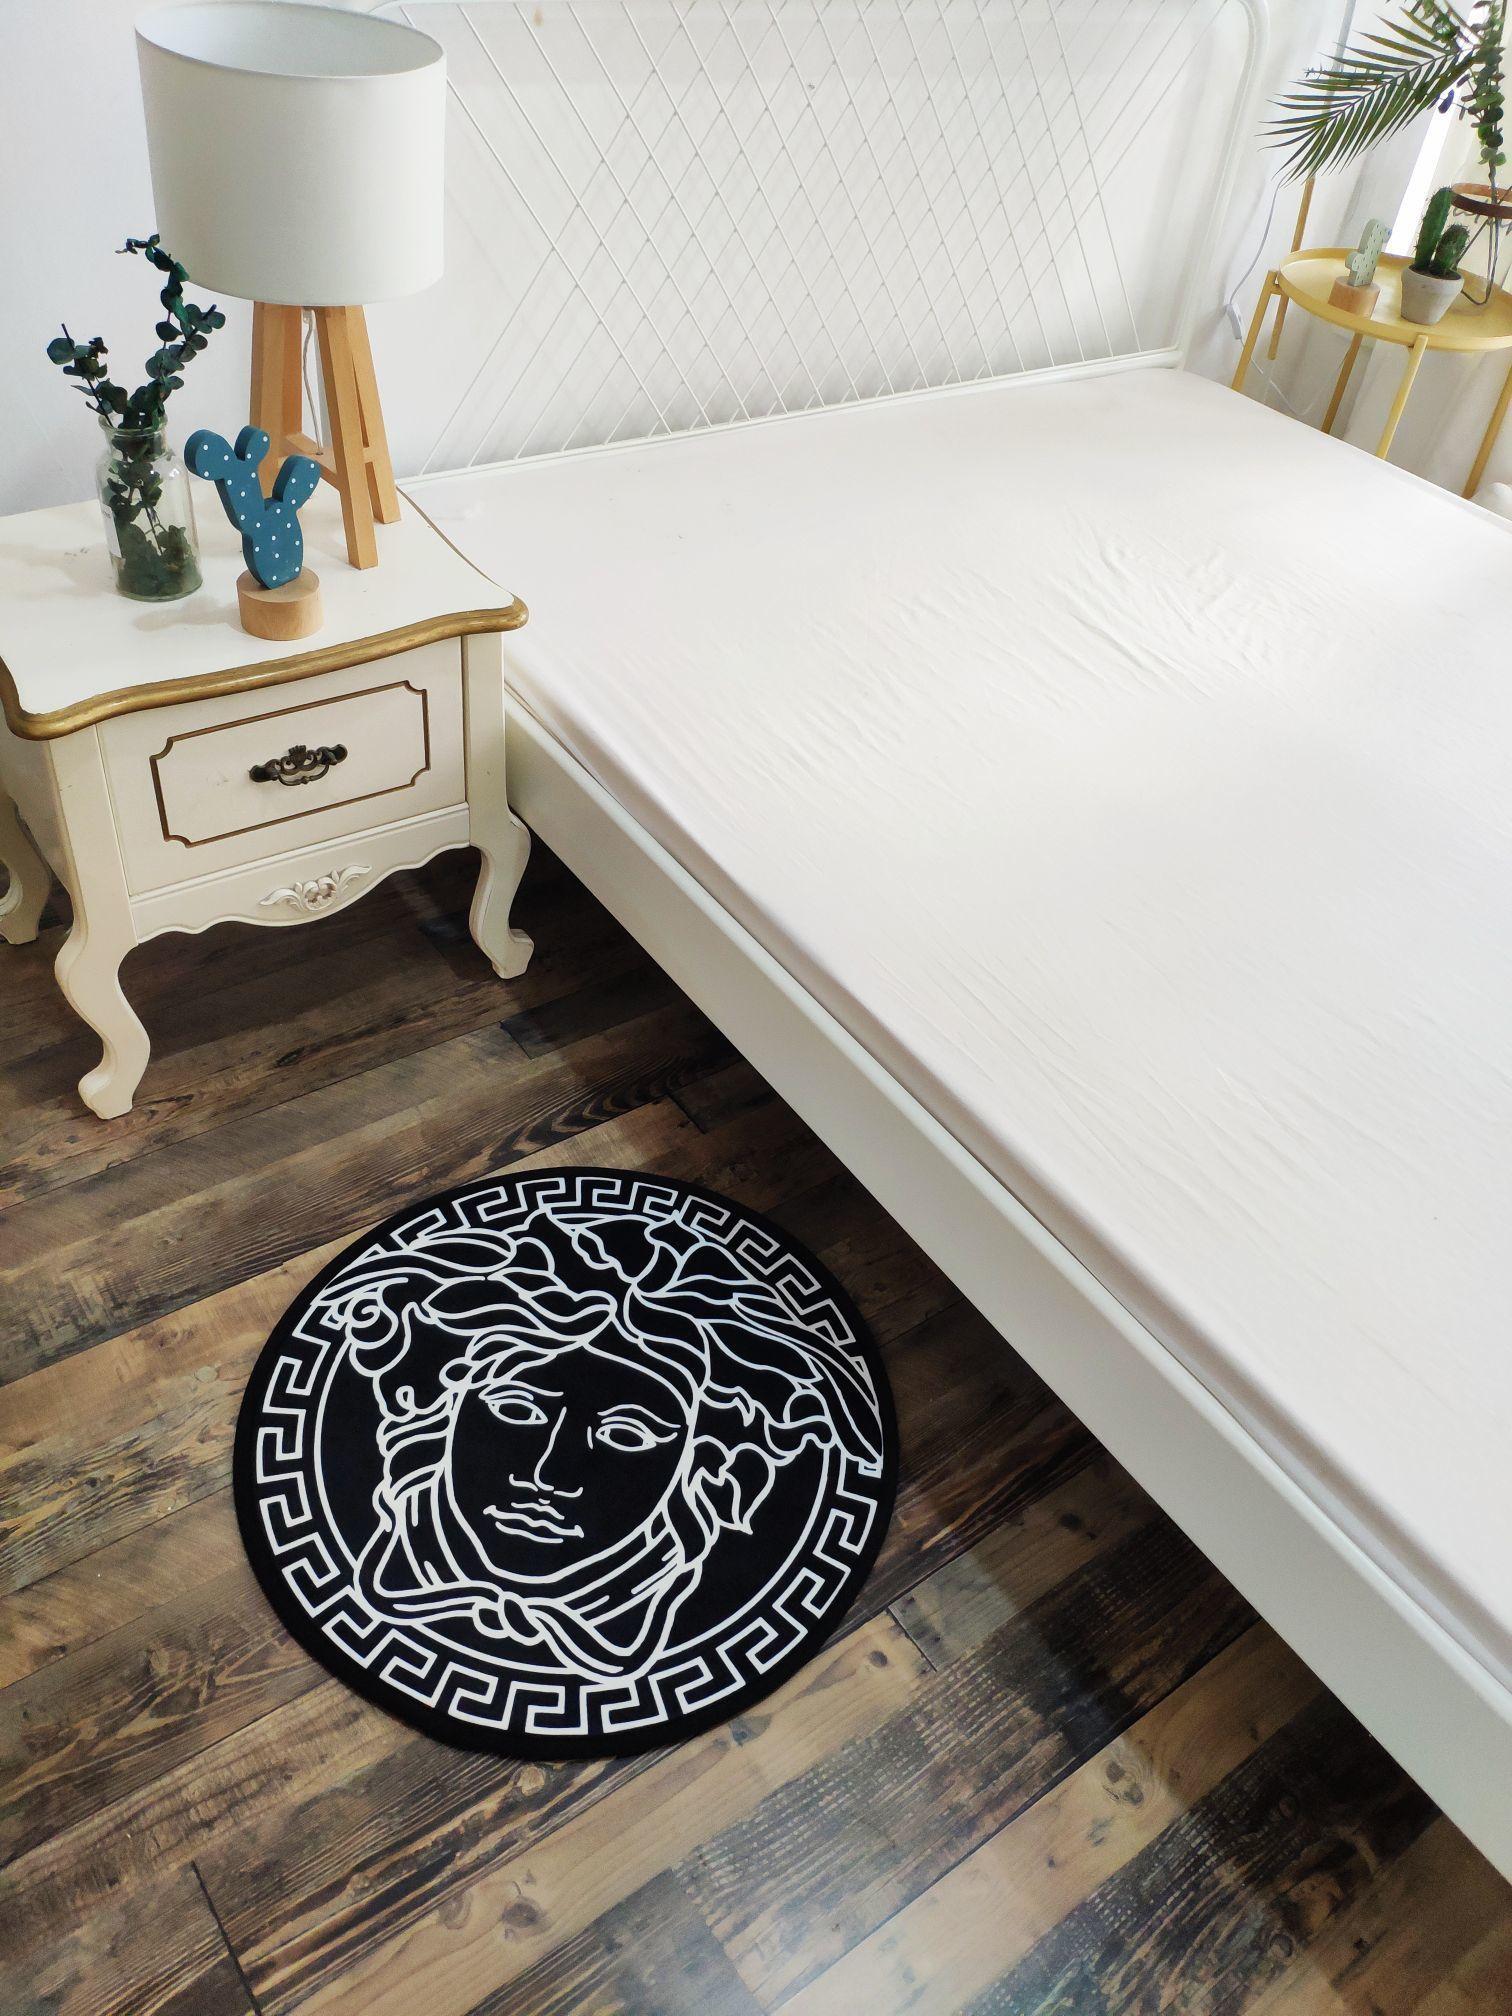 Gold Life Tree Bath Mat Bathroom Carpet Bedroom Decor Flannel Floor Rug Non-Slip